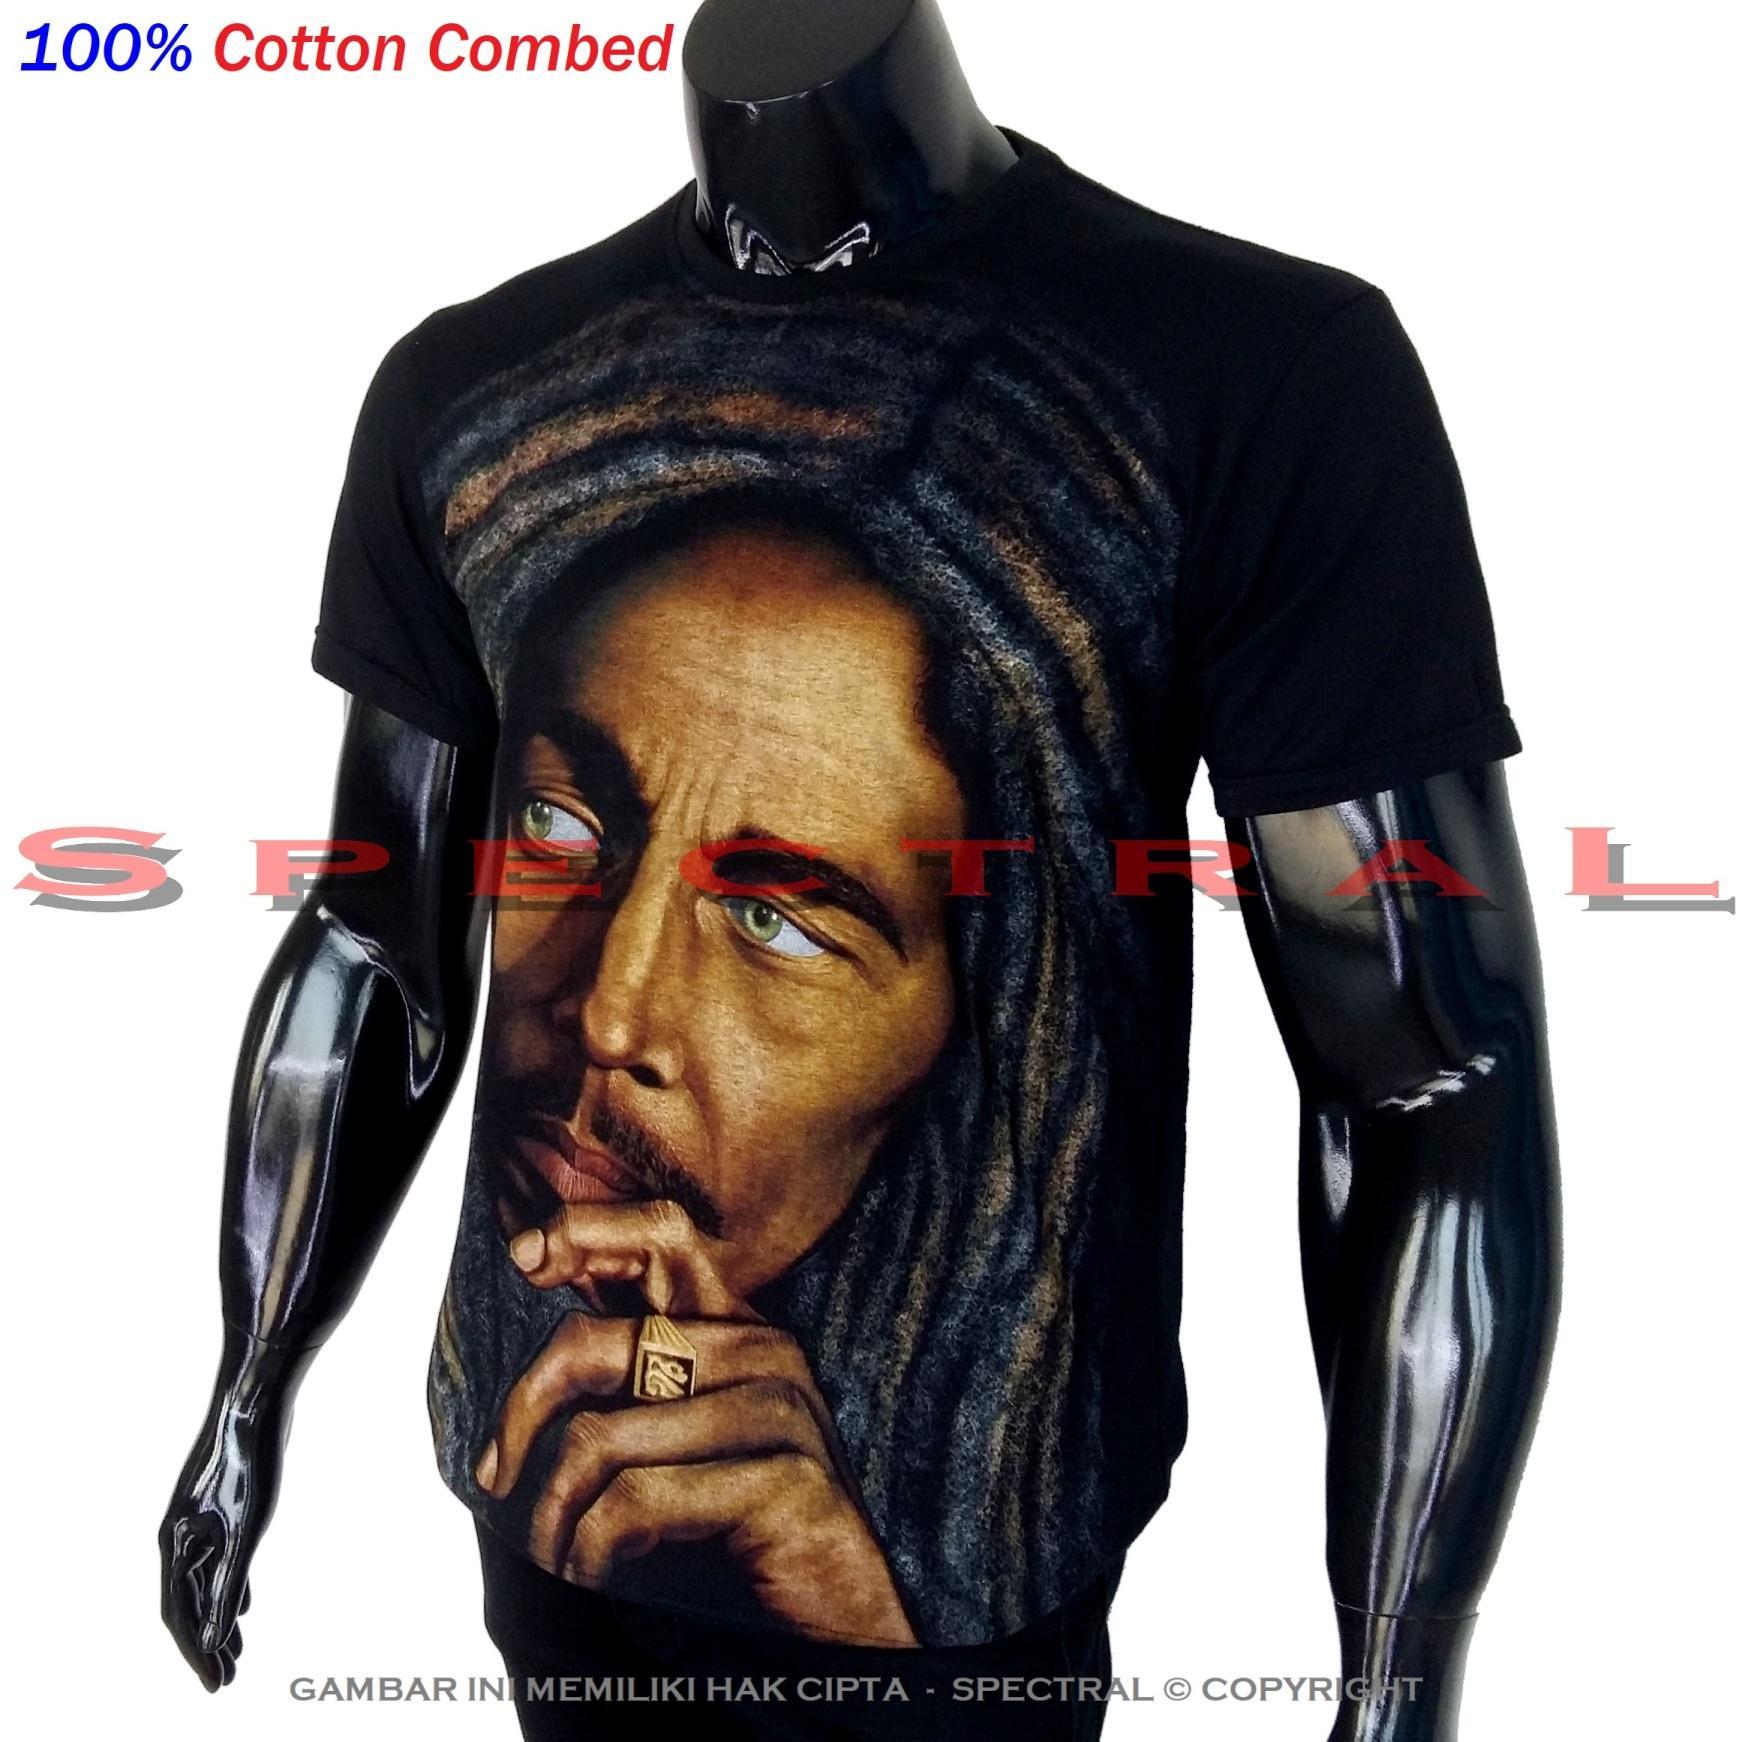 Spectral - Premium 100% Cotton Combed Bob Marley Musik Band Gitar Ganja Rasta Rambut Gimbal Bobmarley